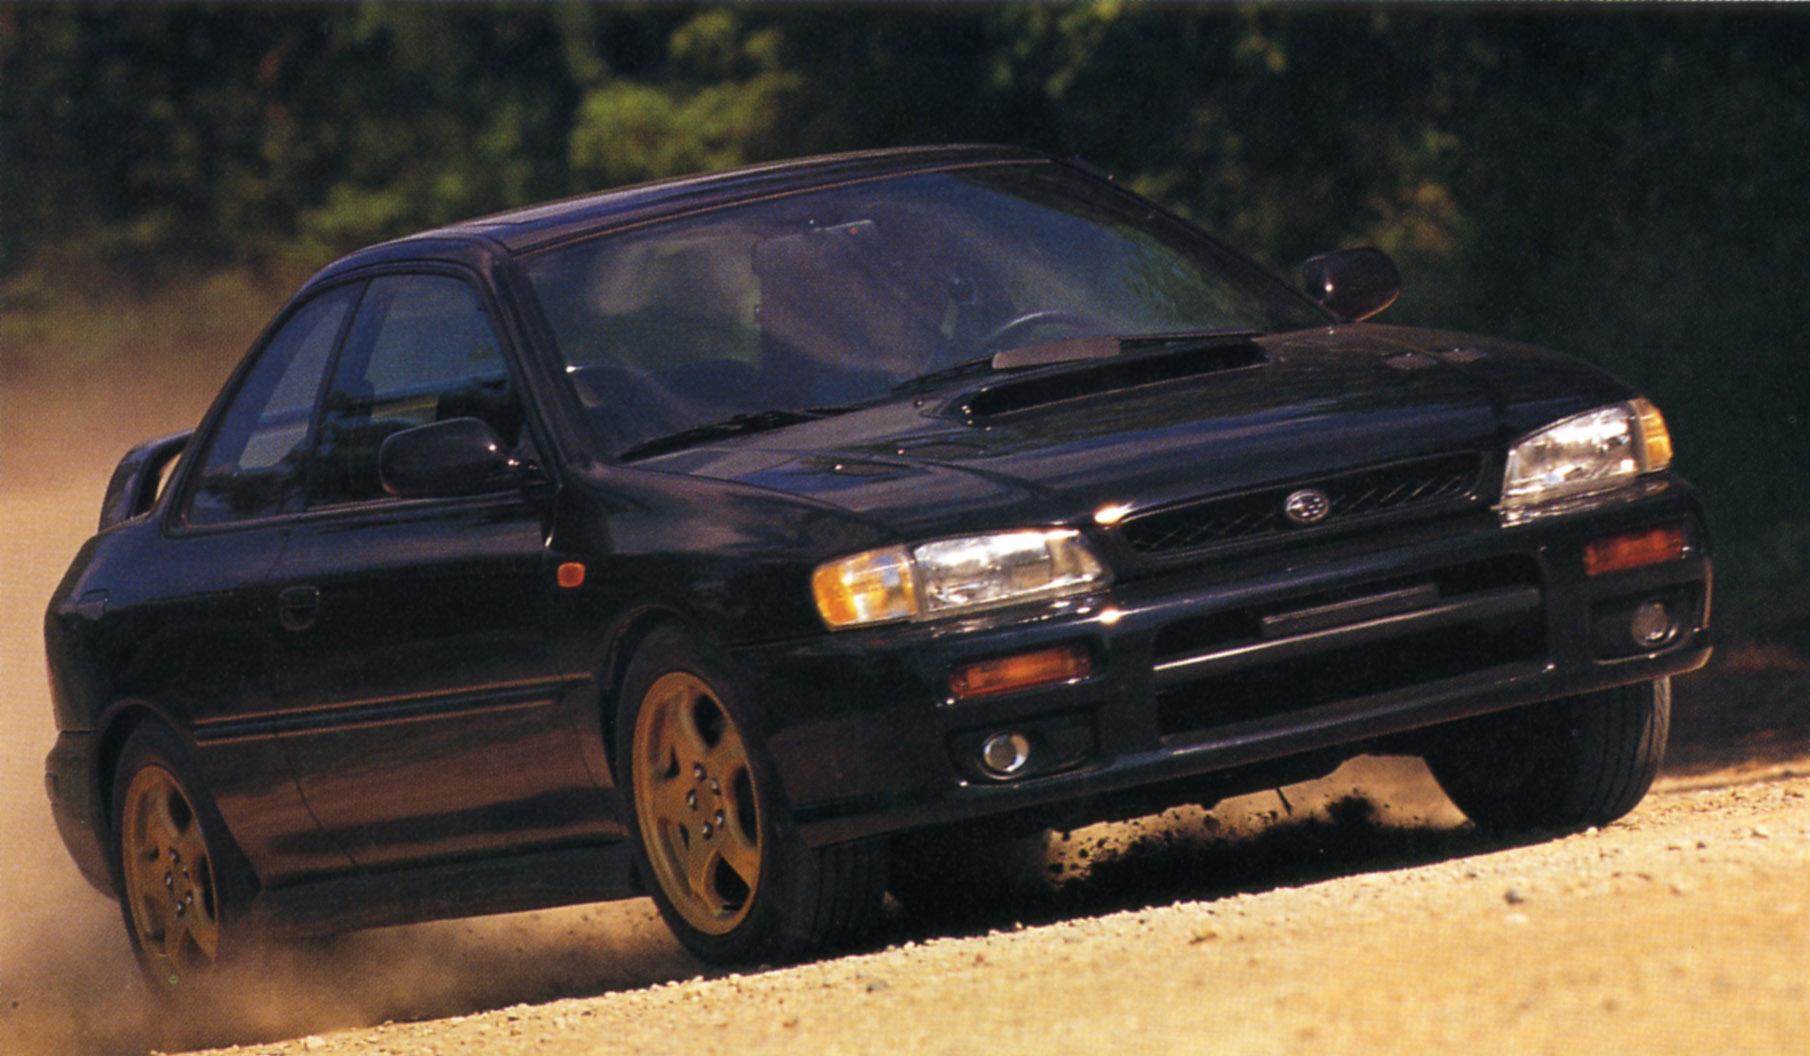 1993 Subaru Impreza RS